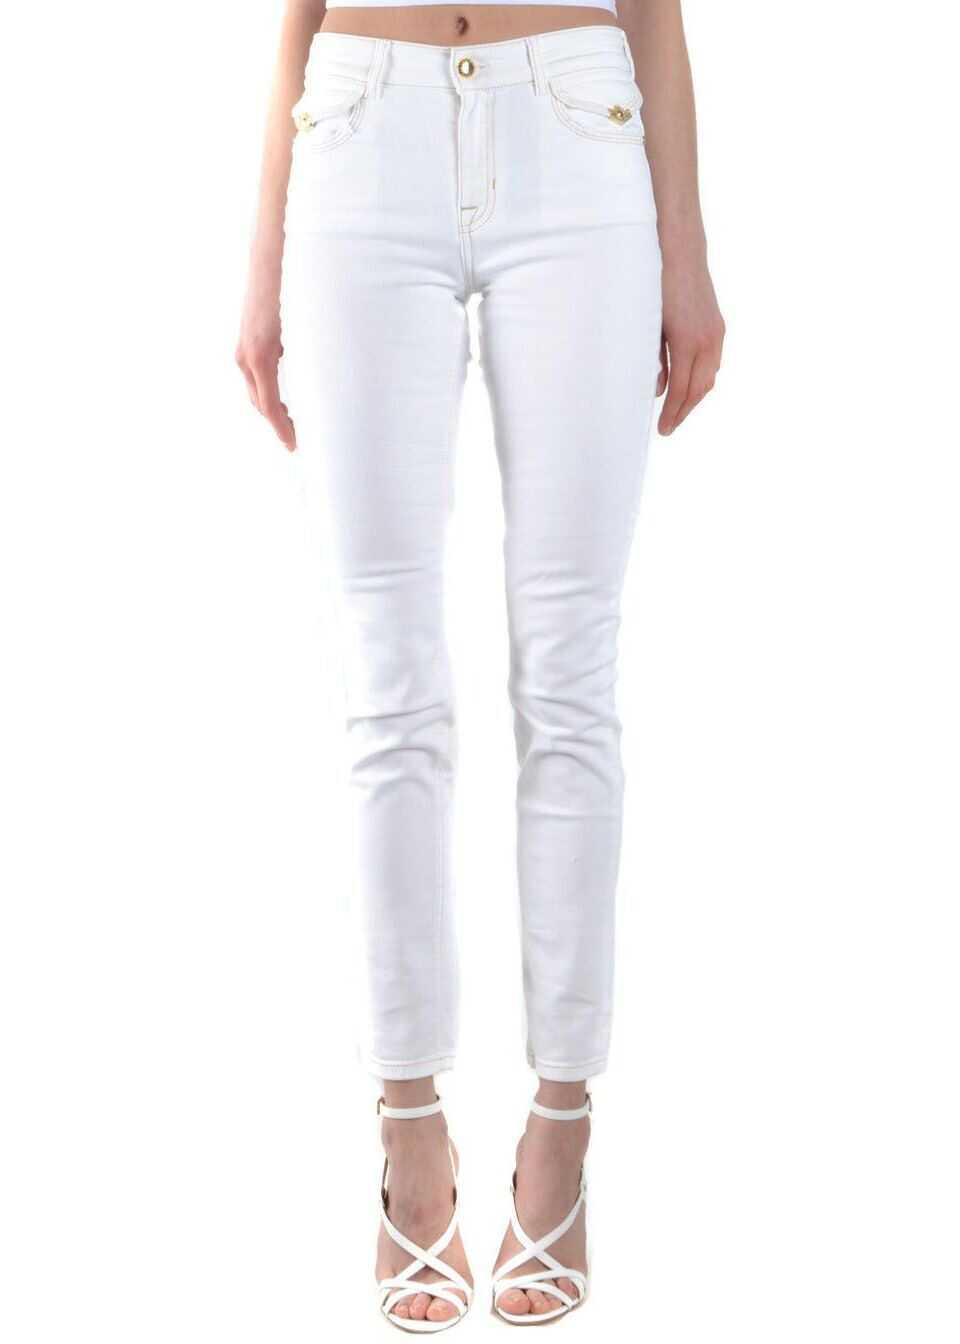 Versace Jeans Cotton Jeans WHITE